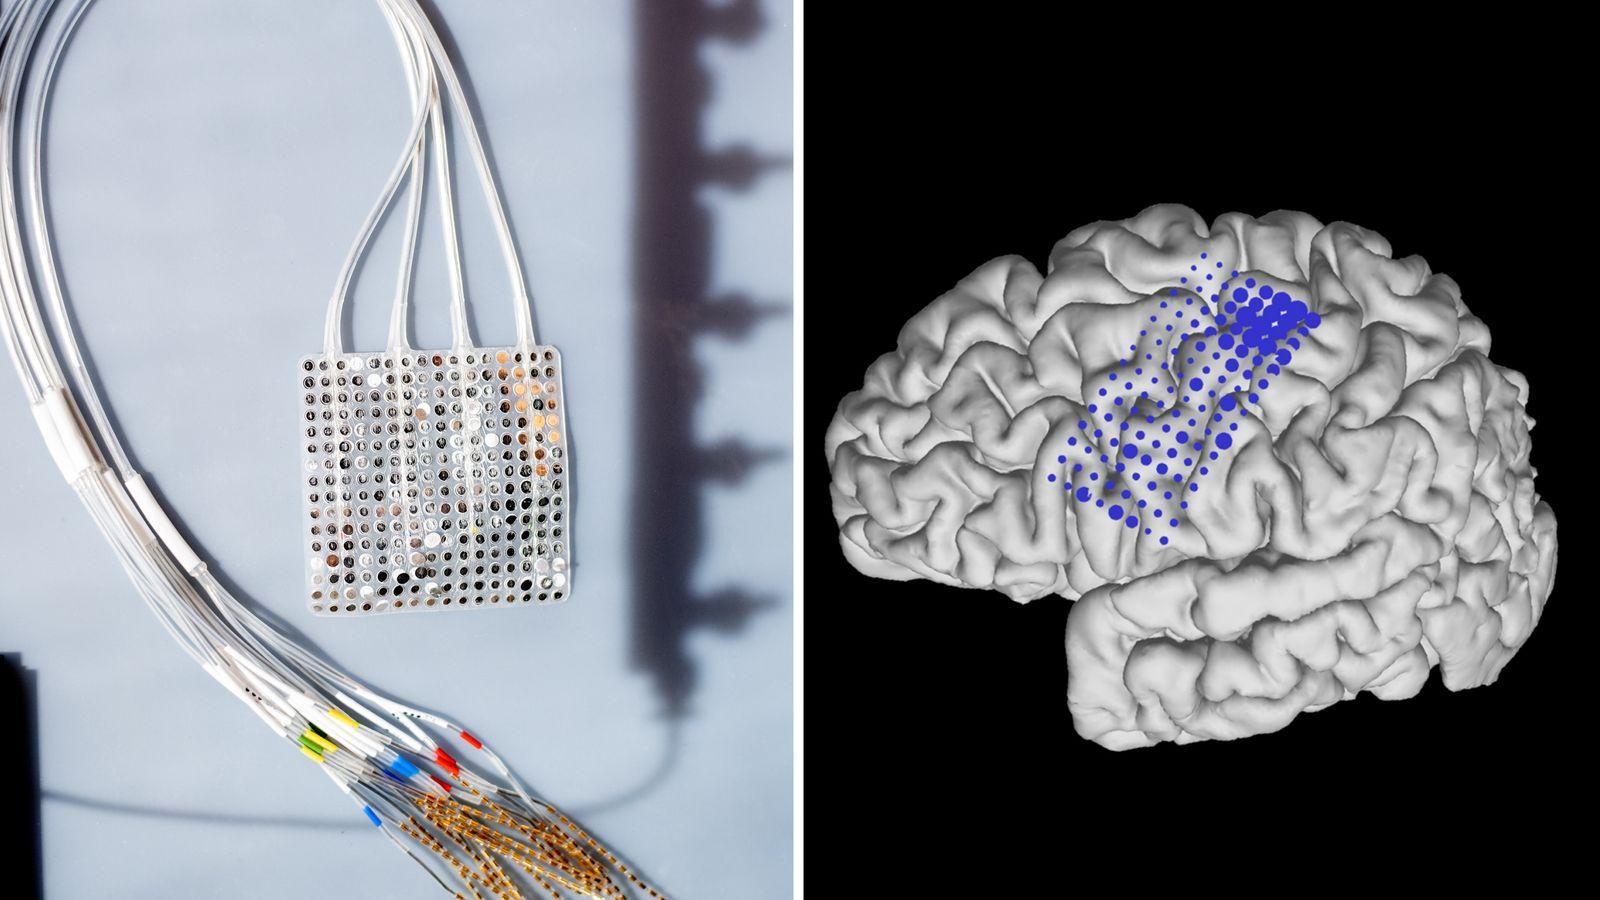 skynews uscf brain implant 5089743 توسعه اولین پروتز مغزی بینیاز از کالیبره سازی اخبار IT